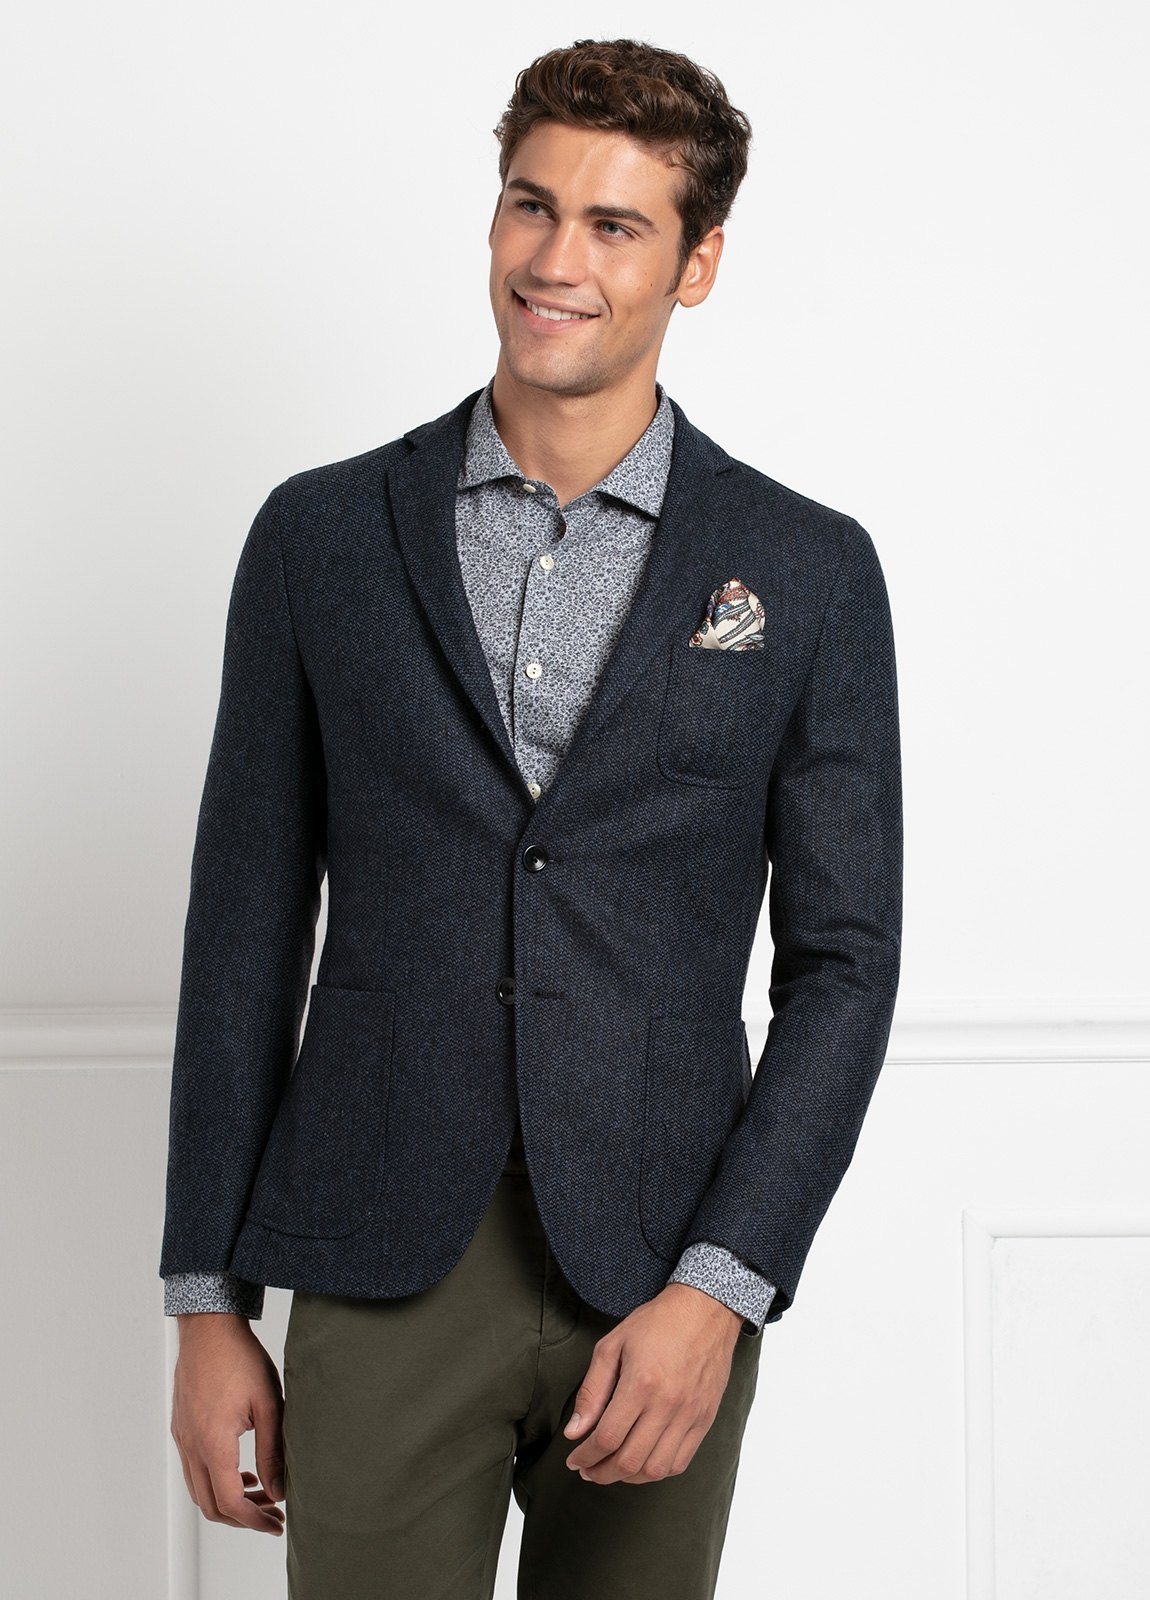 Americana SOFT JACKET Slim Fit, tejido textura color azul oscuro. 97% Lana, 3% Cashmere. - Ítem1